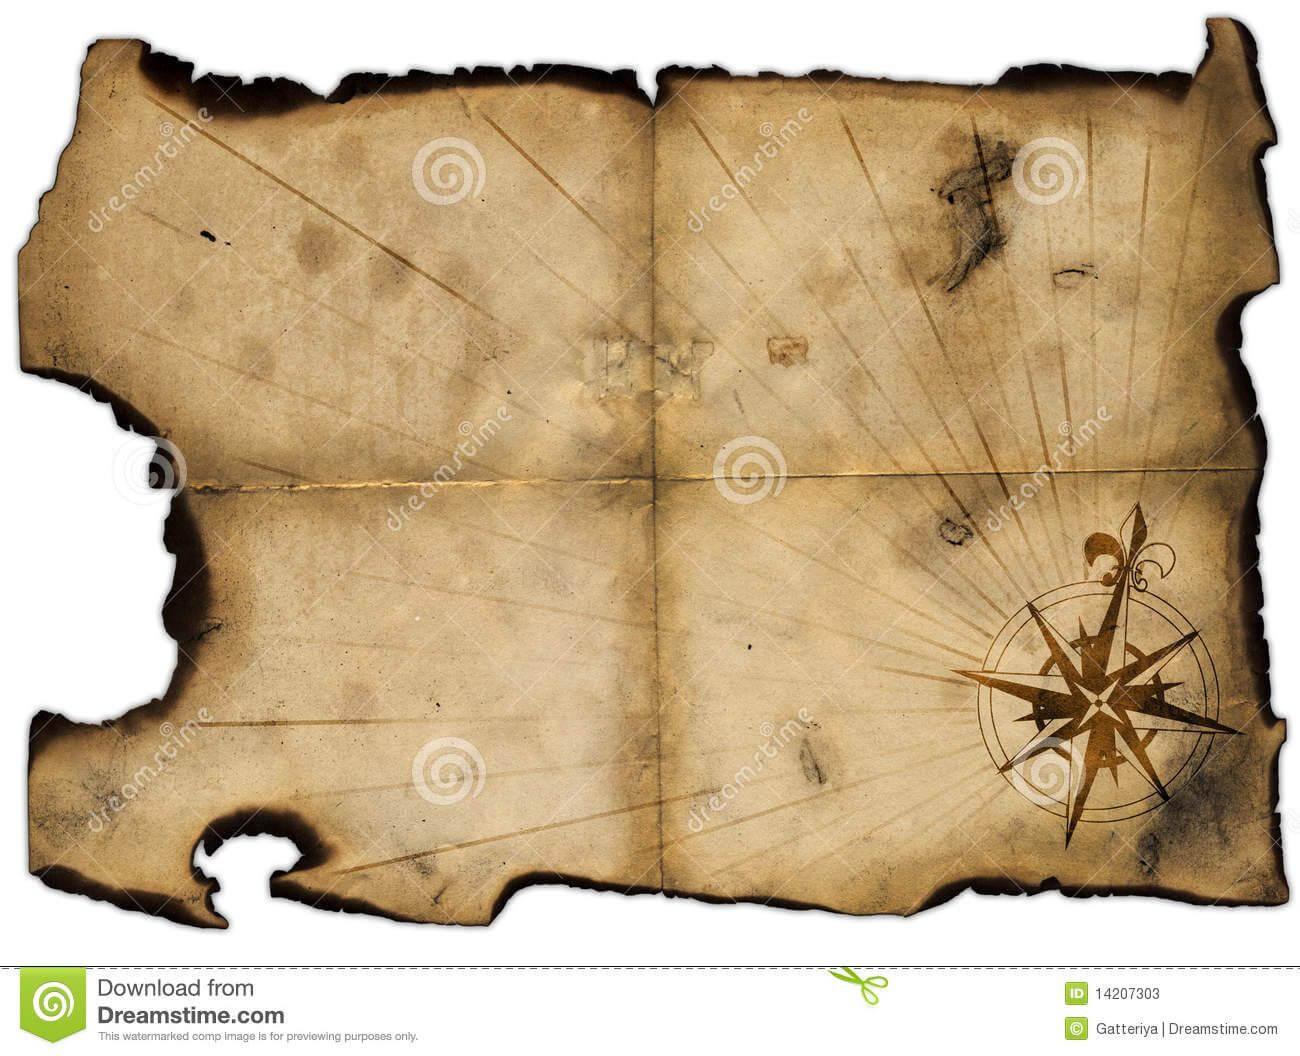 Blank Treasure Map Template - Videotekaalex.tk | Pirate Maps With Blank Pirate Map Template